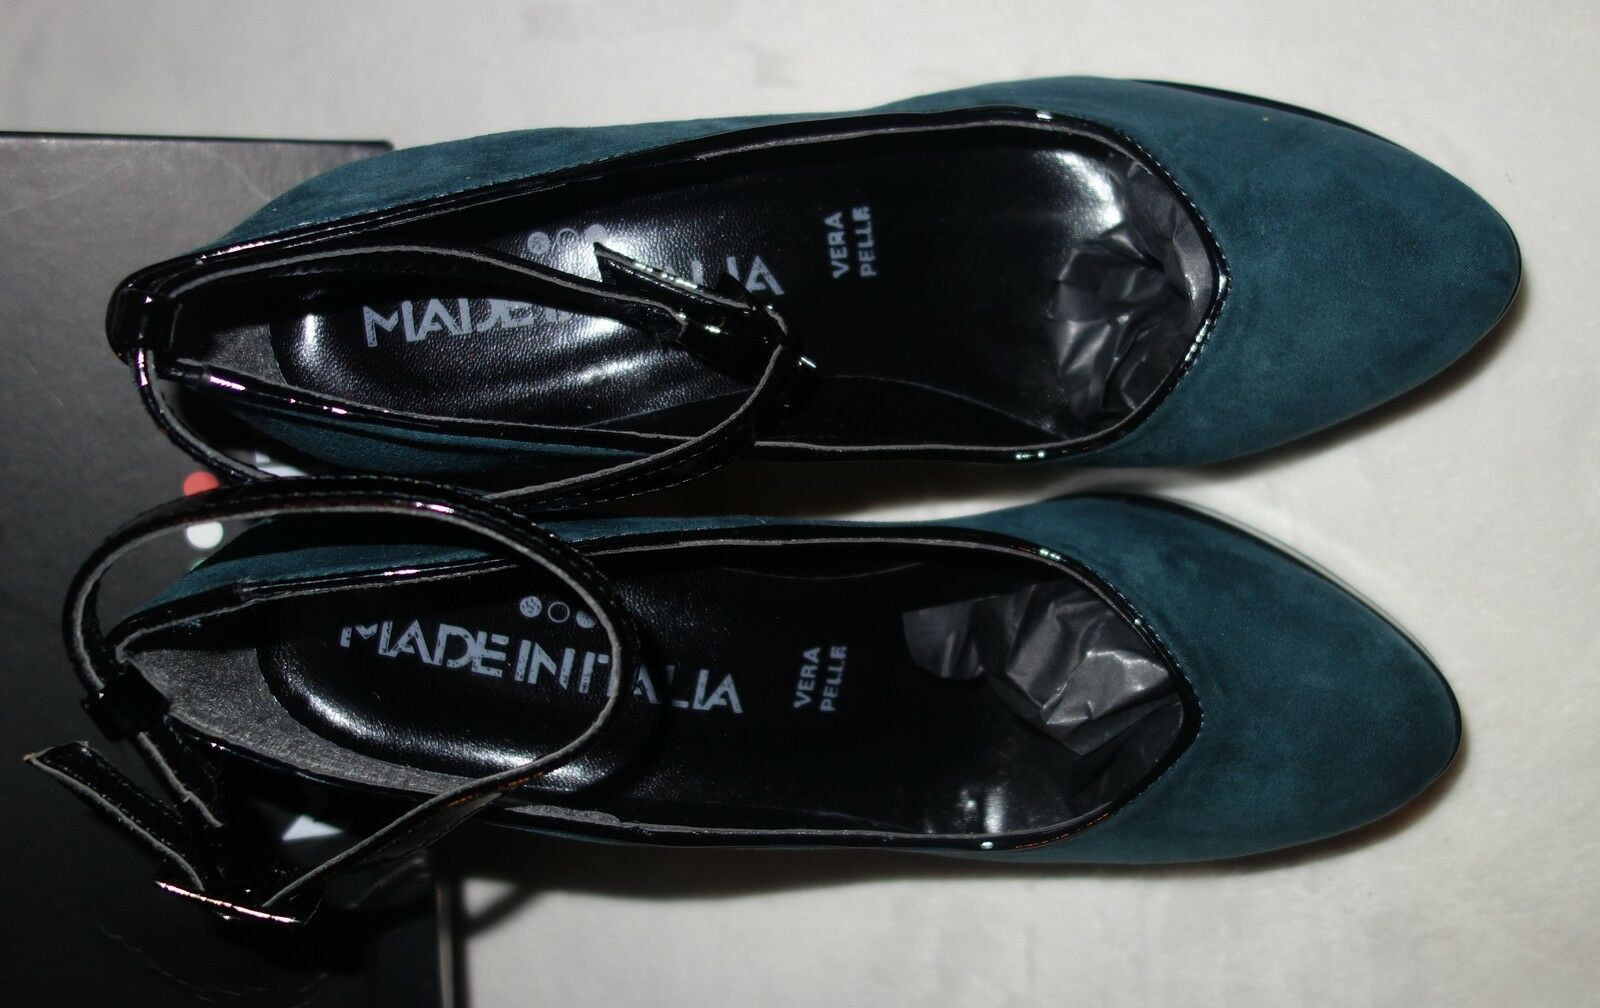 Made Made Made in Italia Platform Pumps petrol Suede black trim shoes  Size 40 new 88553c